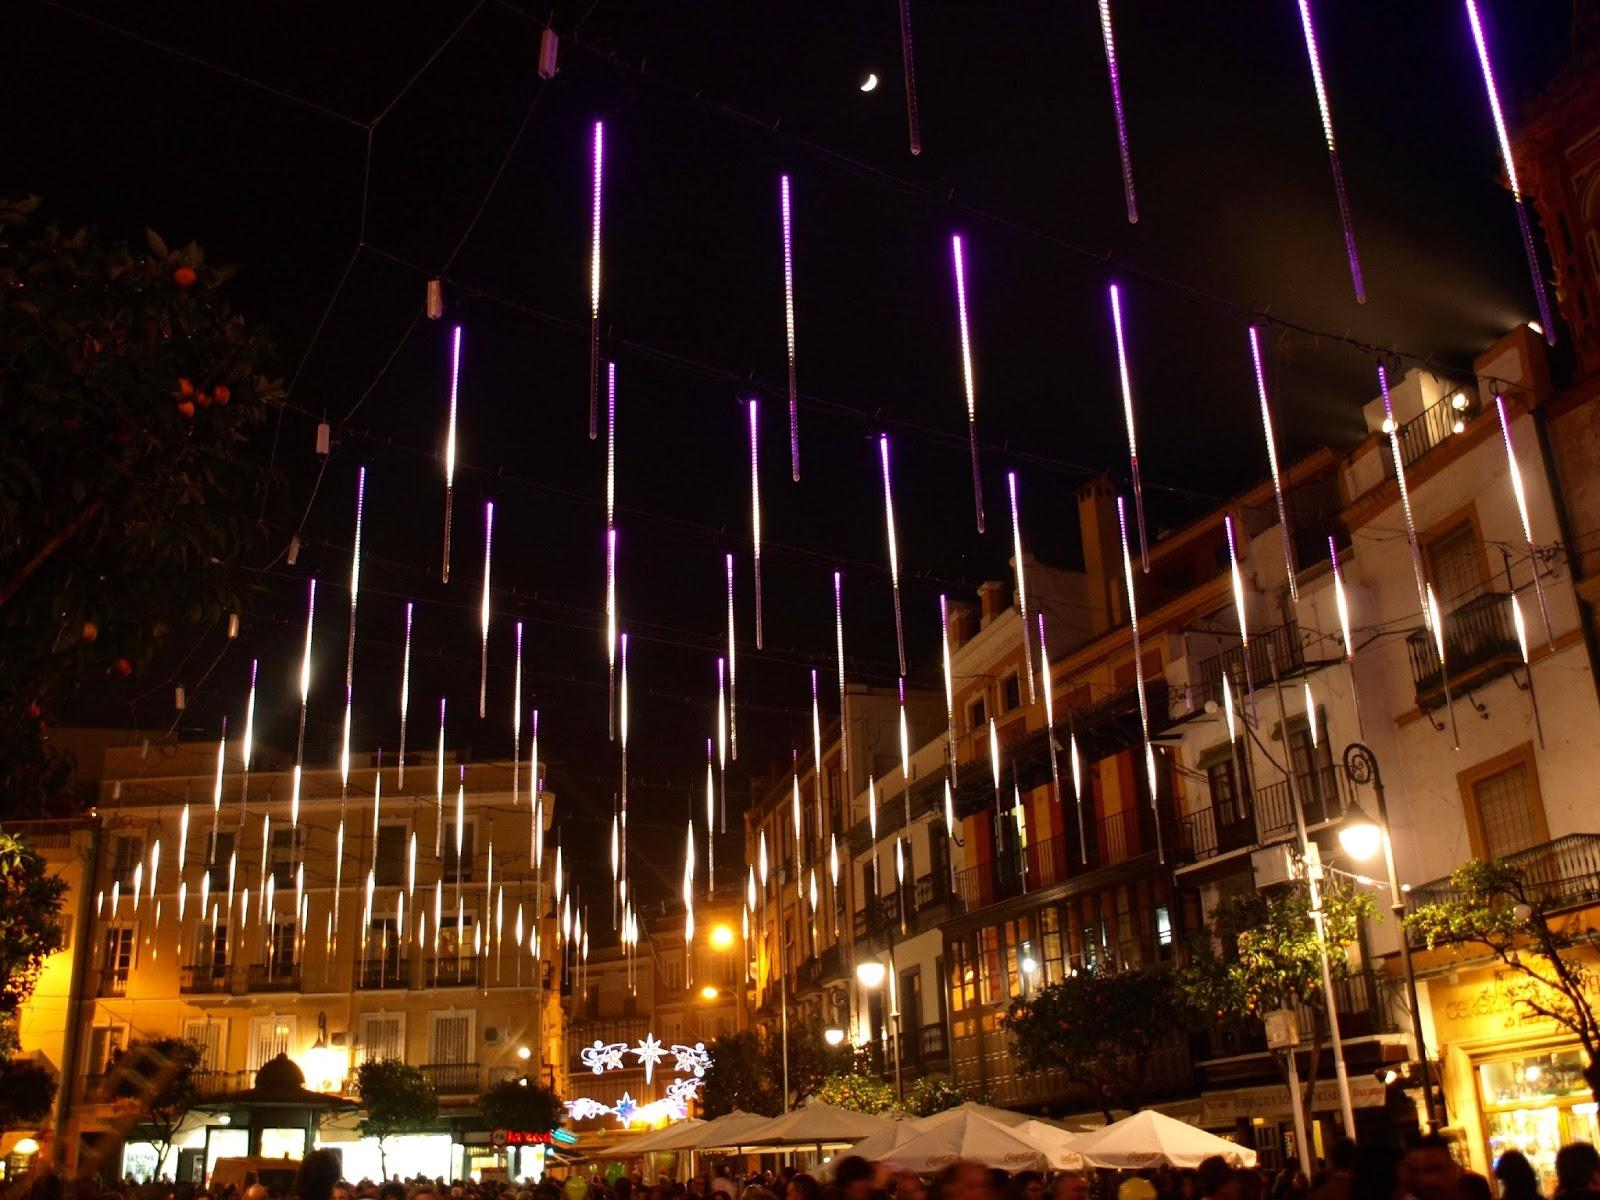 Sevilla Daily Photo Iluminacin navidea en la Plaza del